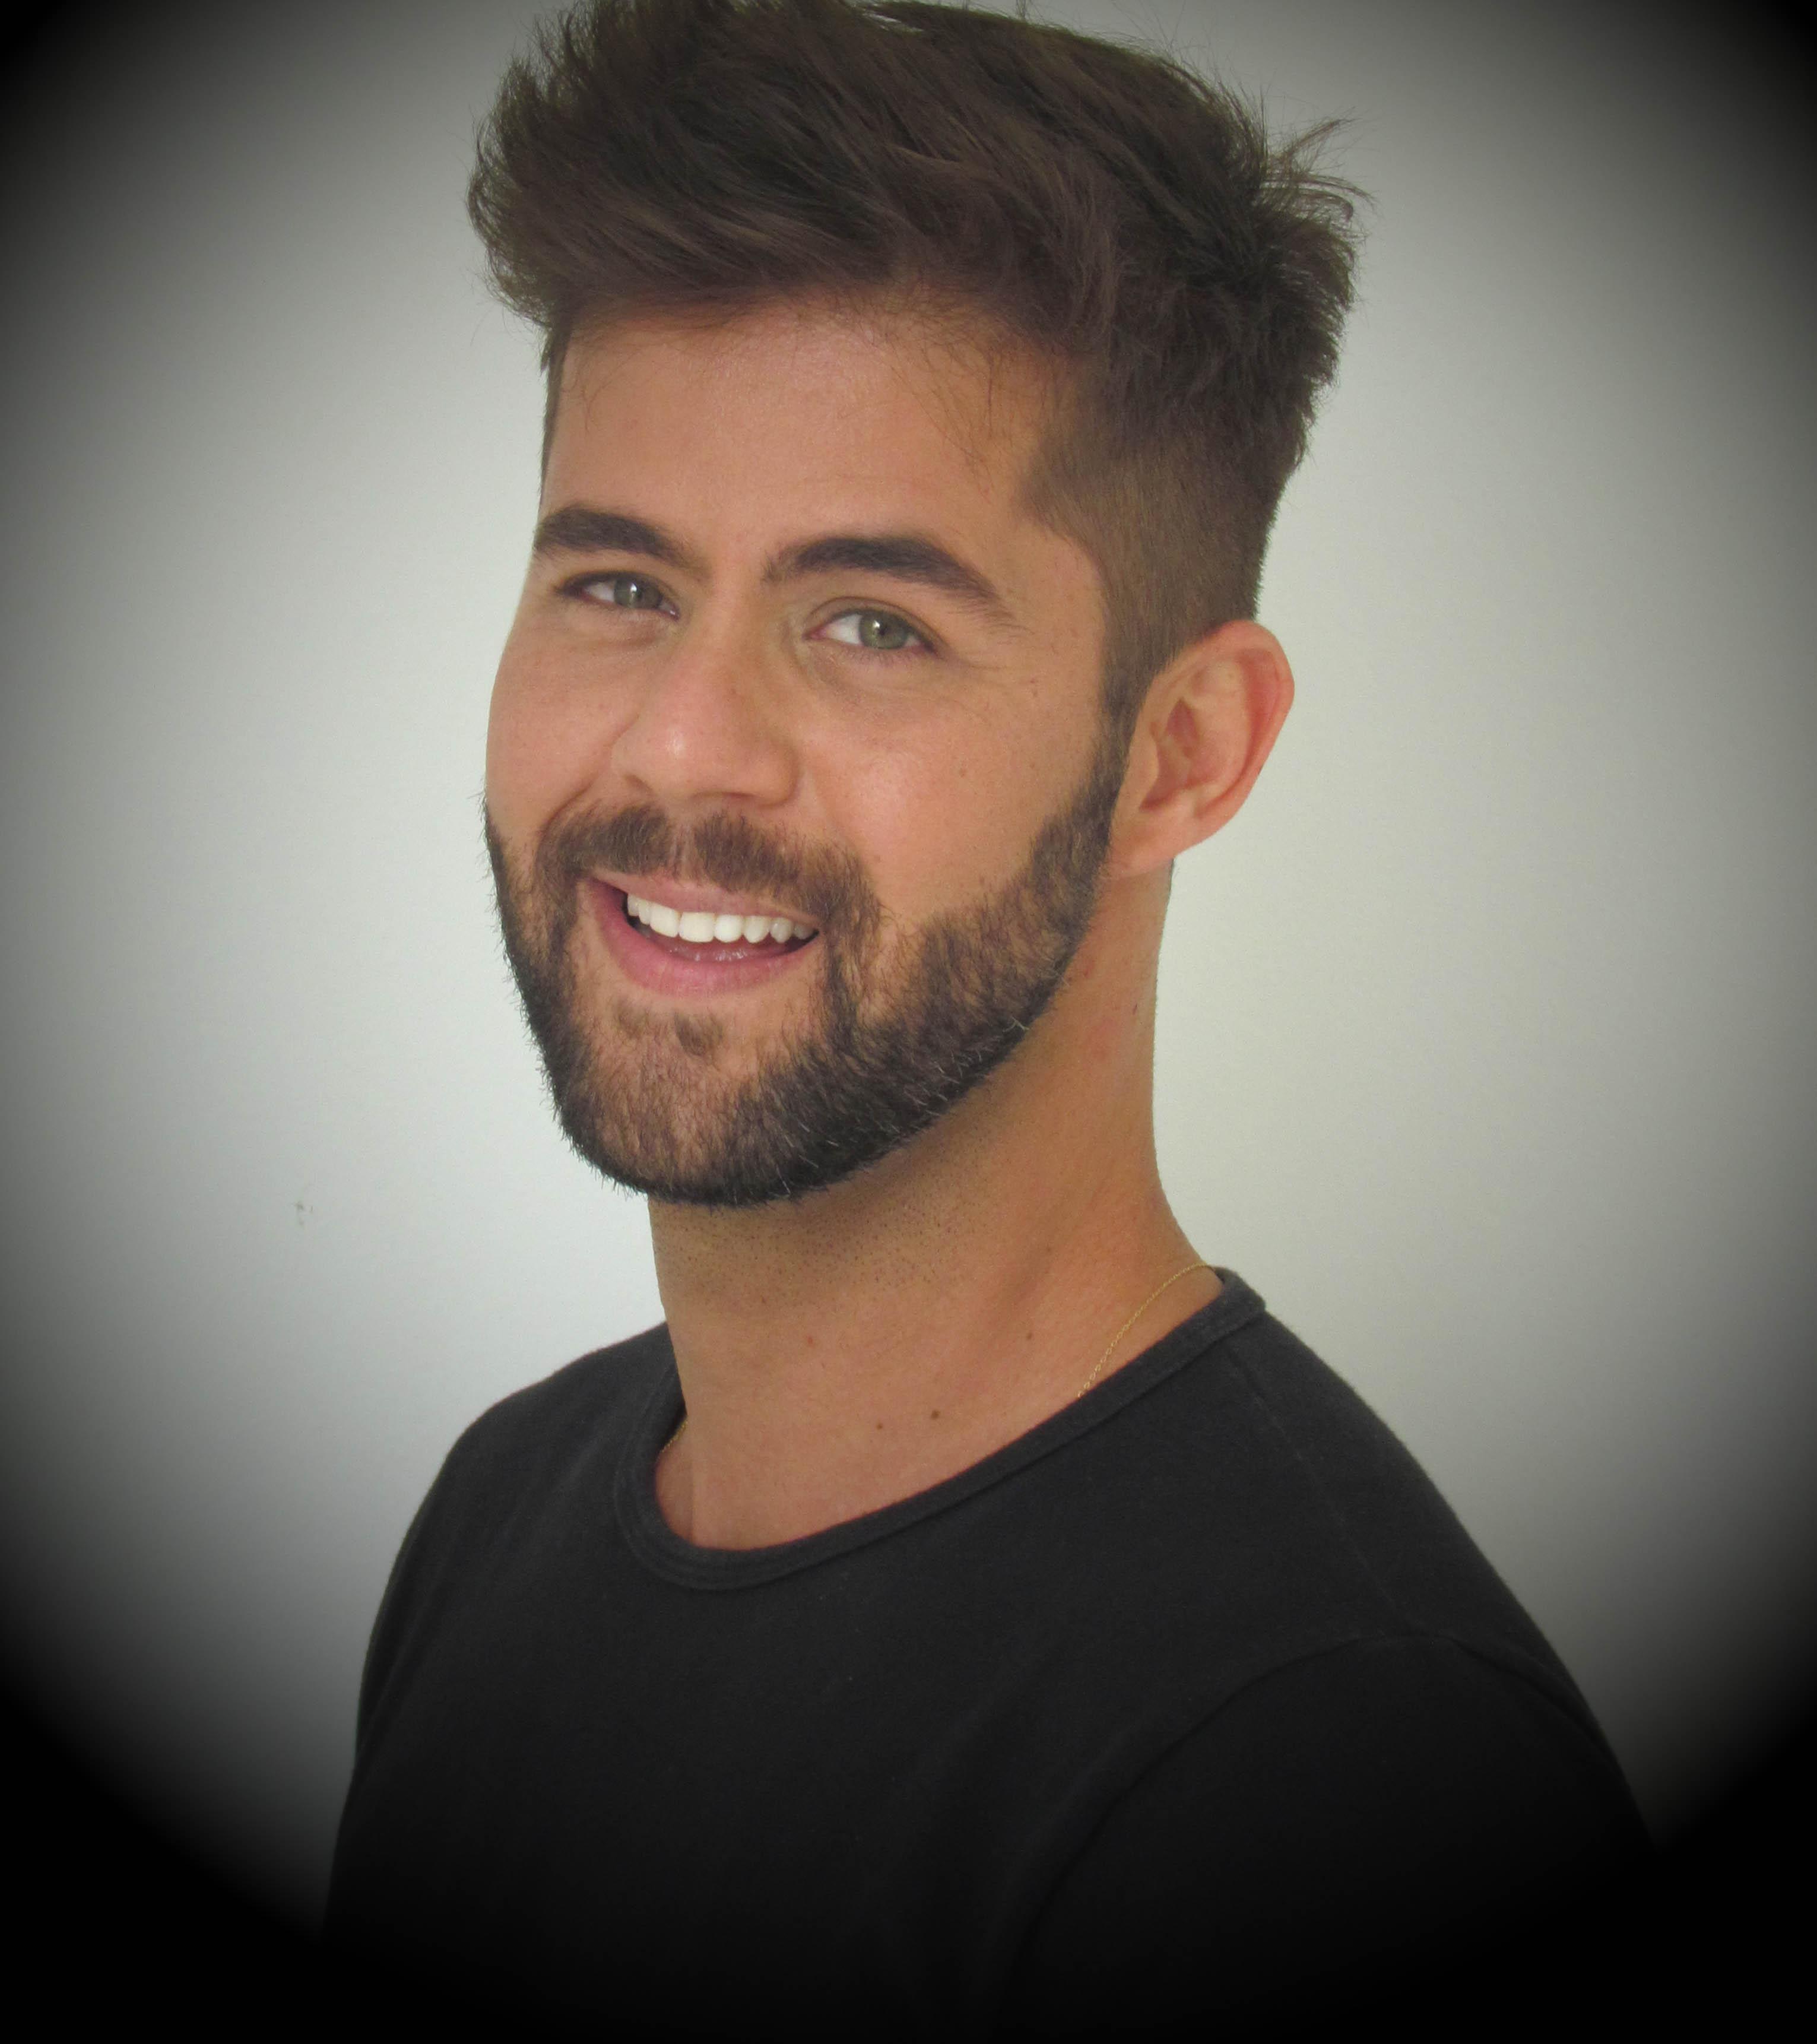 Ótimo fotos cortes de cabelo masculino galeria-Melhor Fotos Cortes De Cabelo Masculino Layout